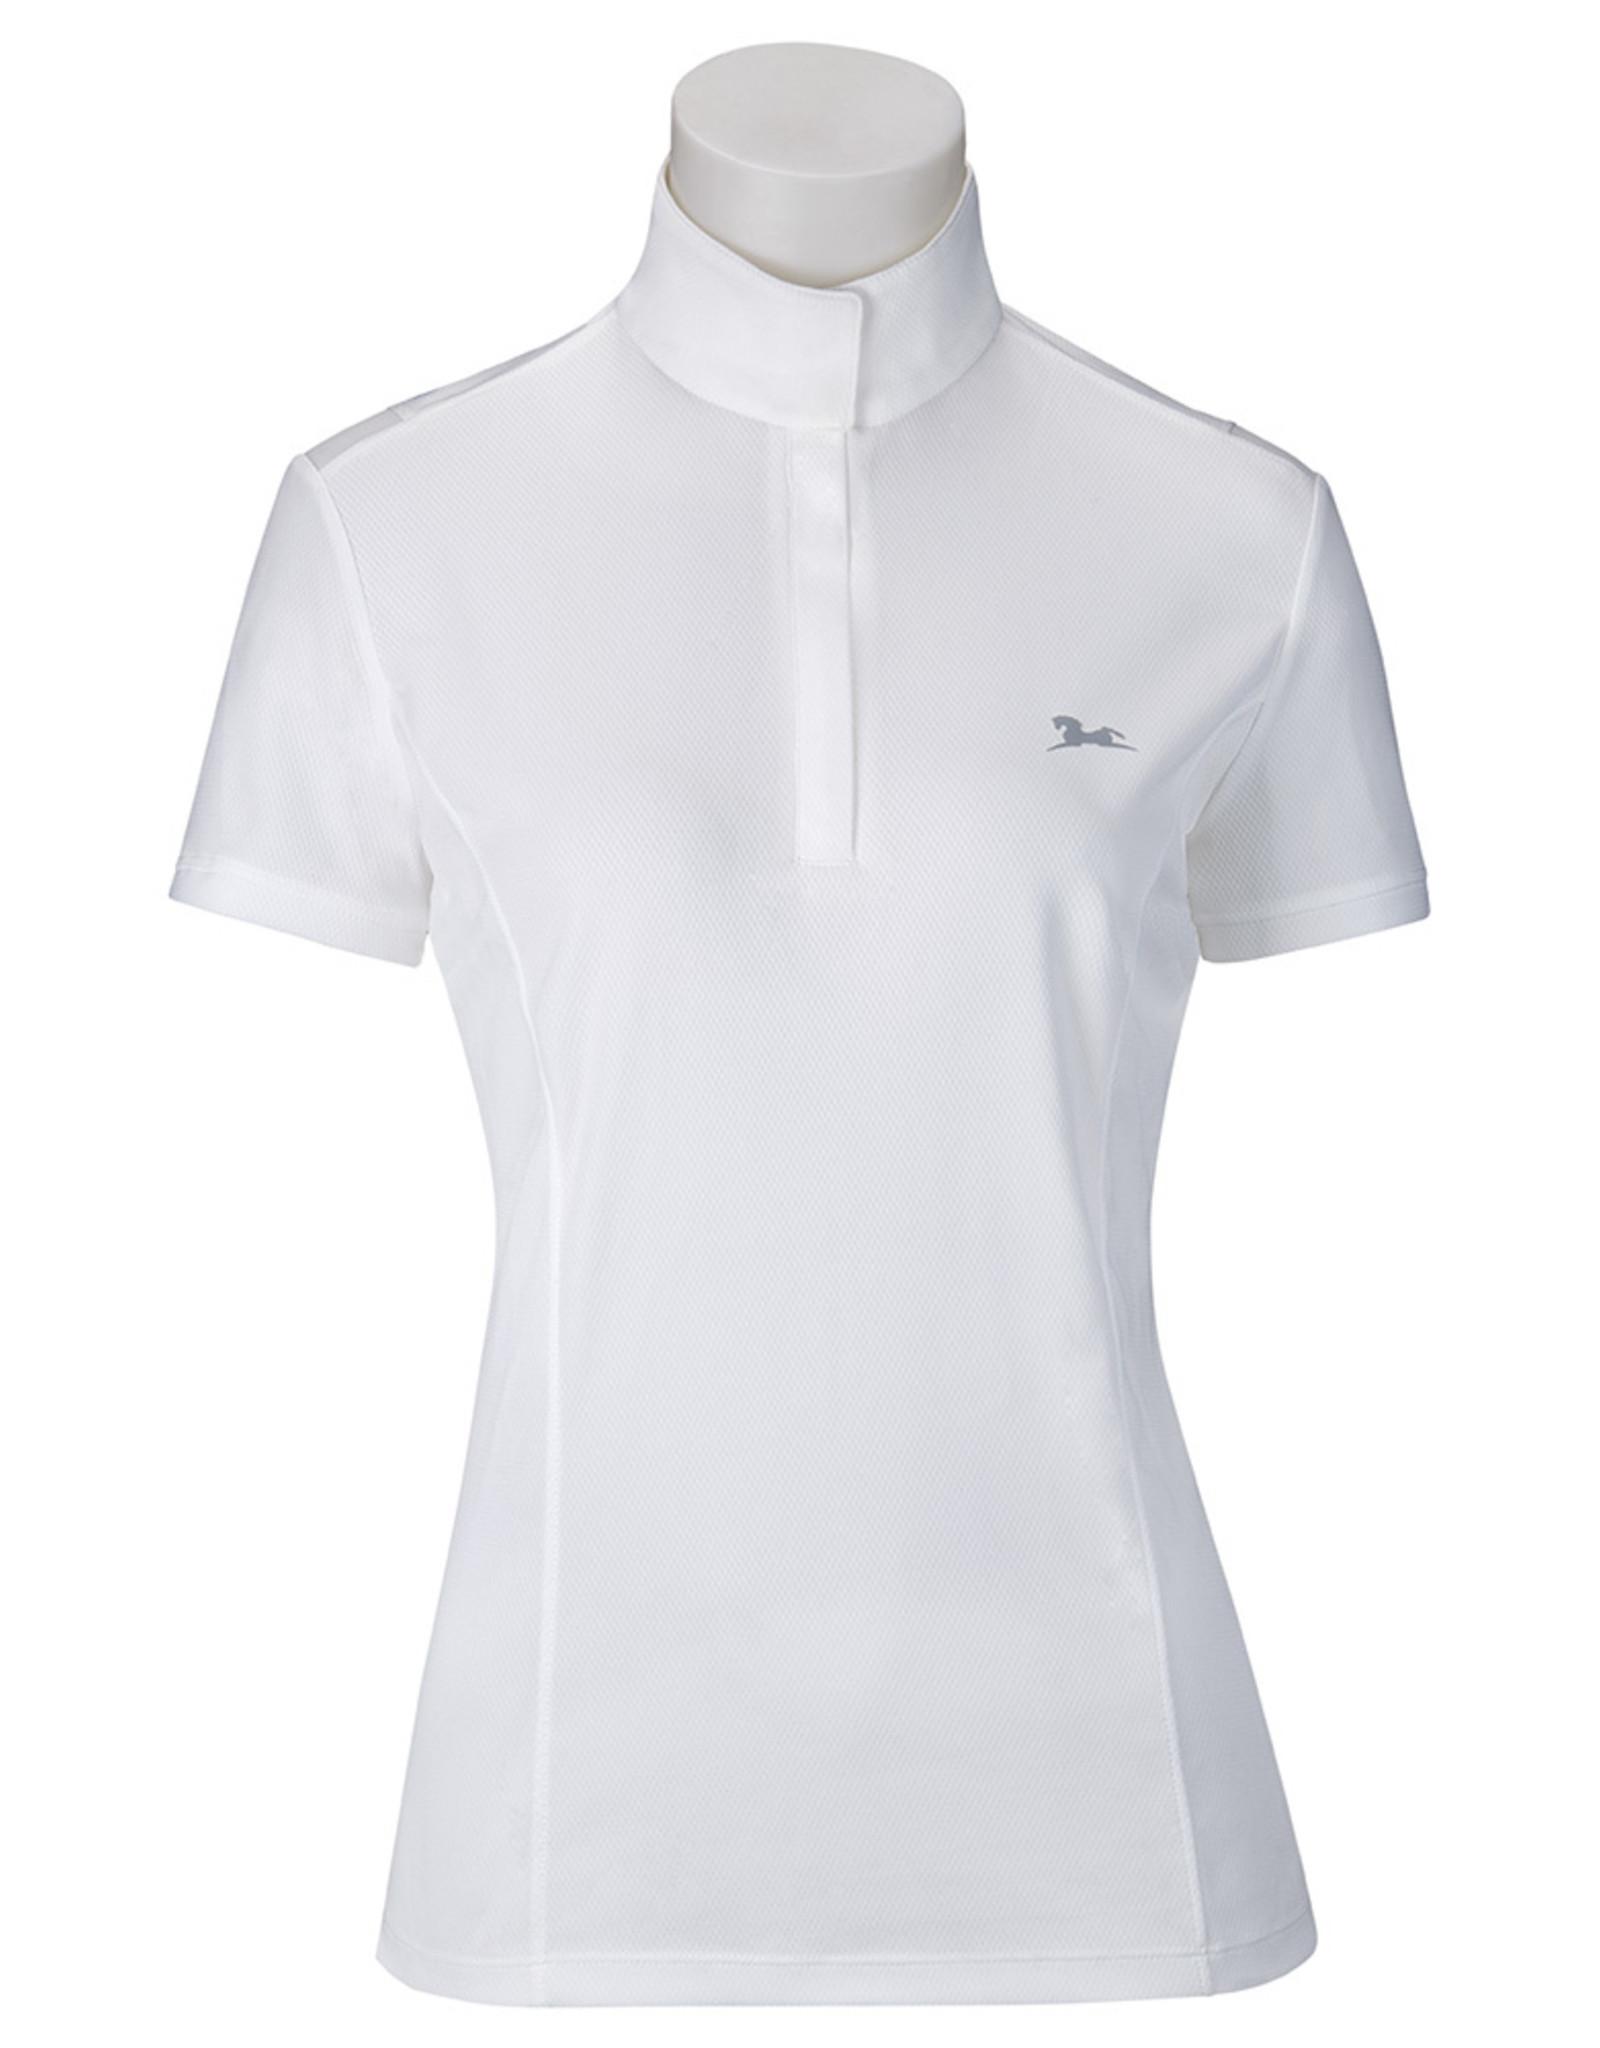 RJ CLASSICS Stella Ladies' Short Sleeve Show Shirt